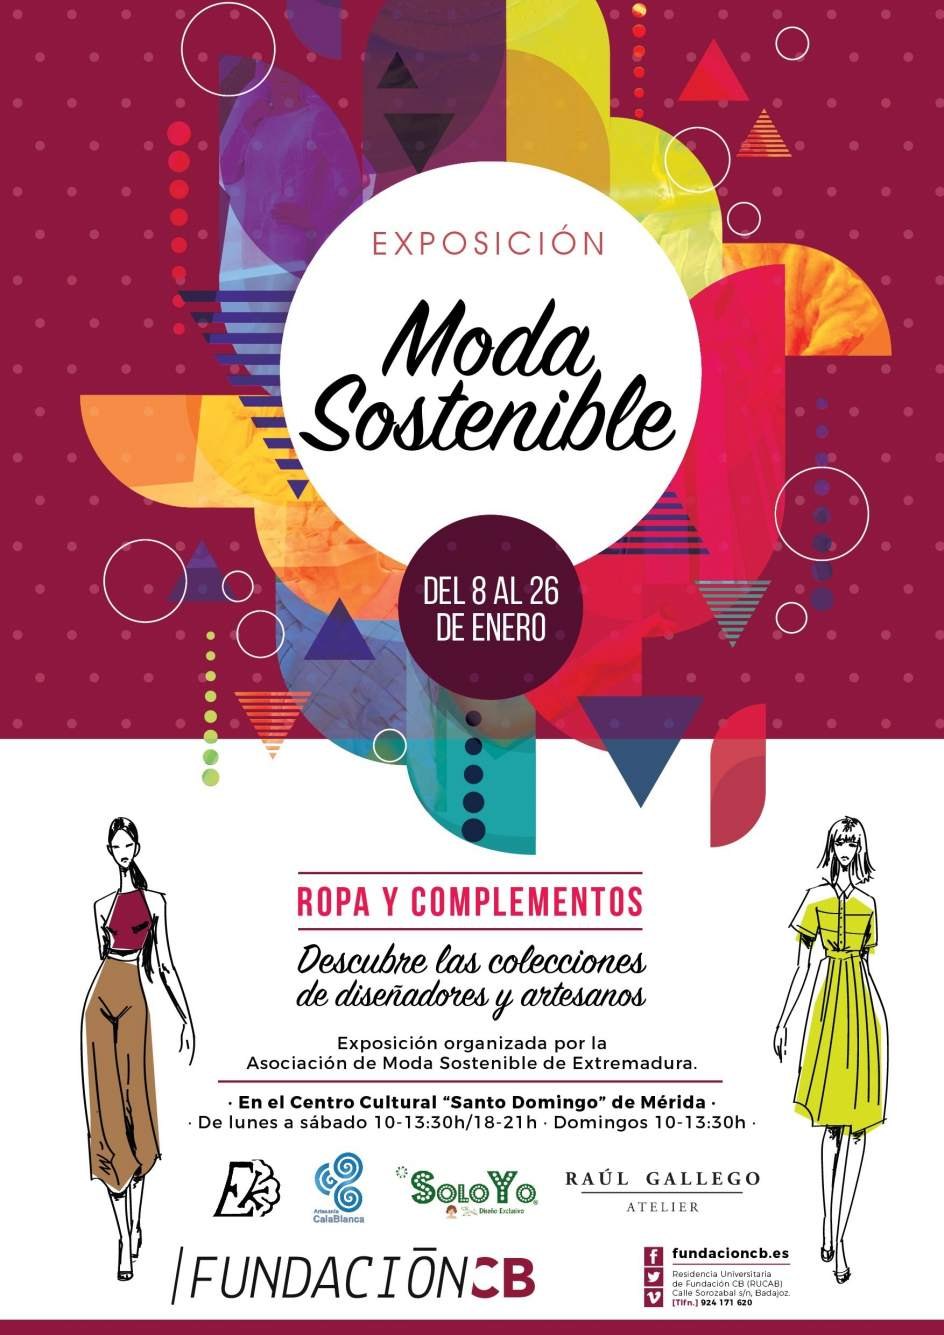 moda-sostenible-expo